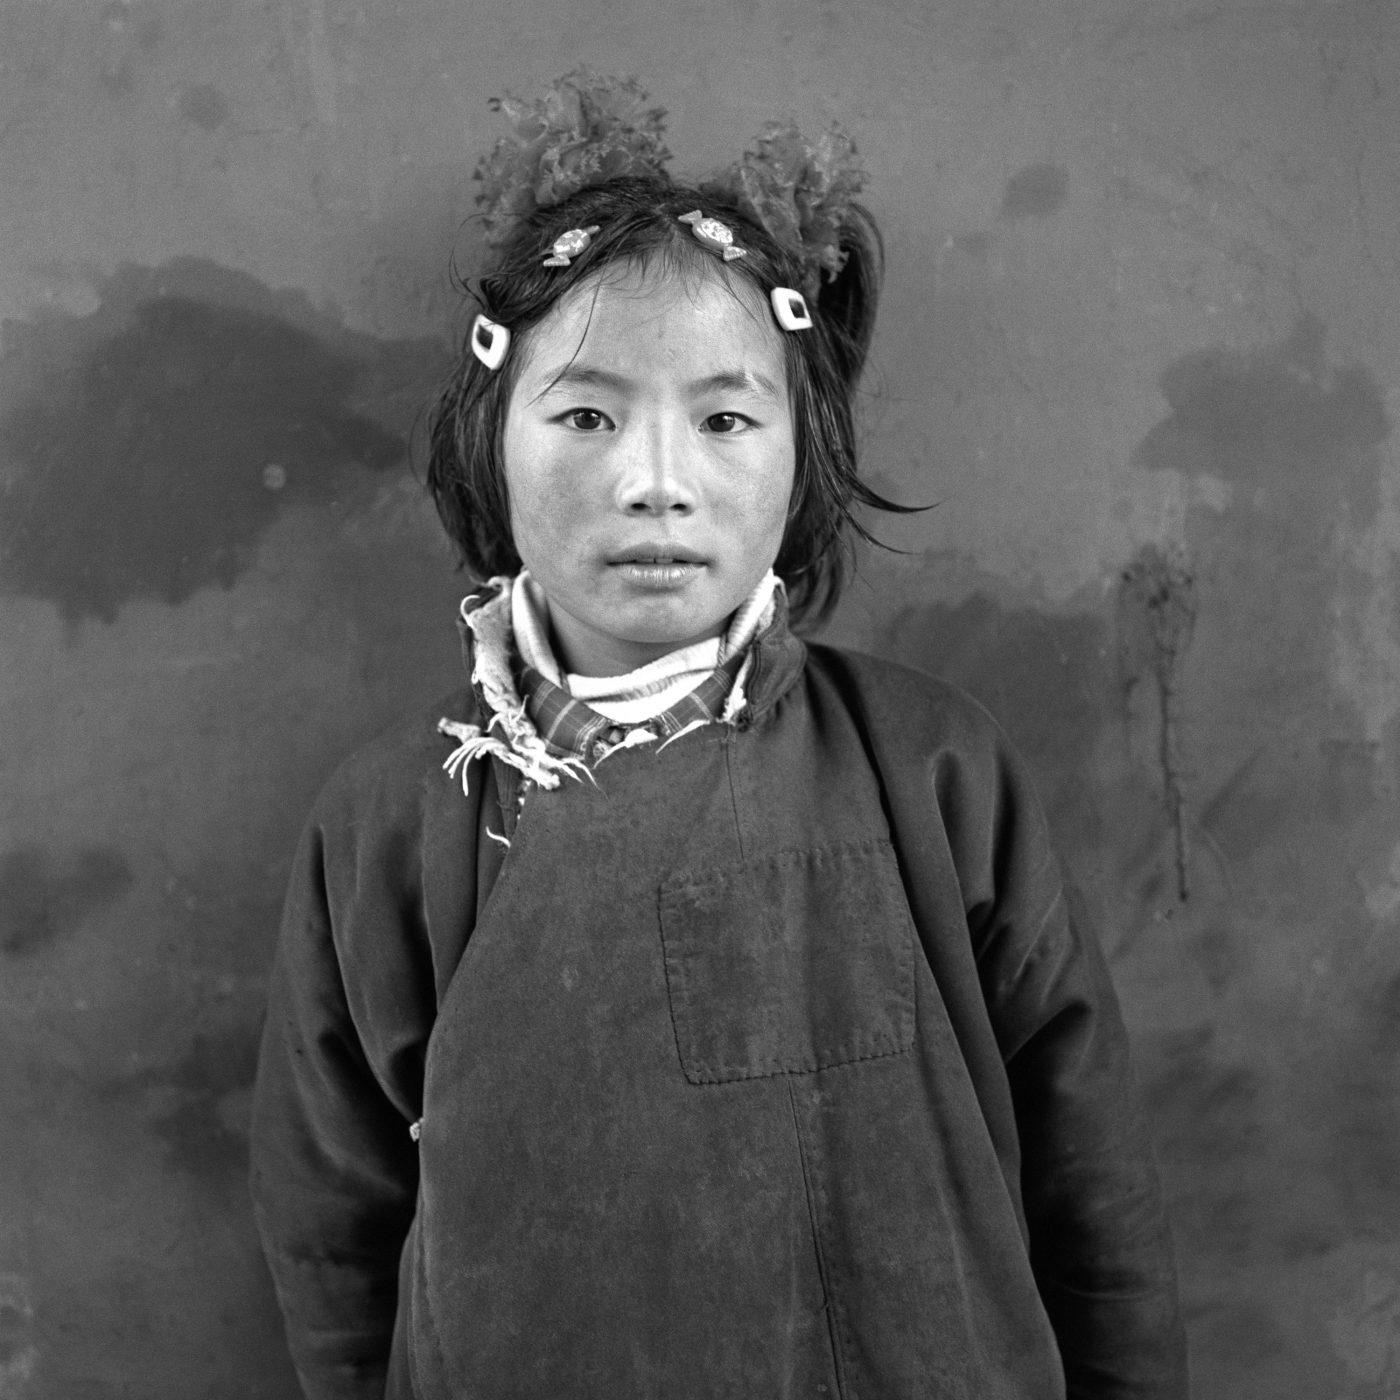 Larry-SNIDER-Young-Tibetan-Girl